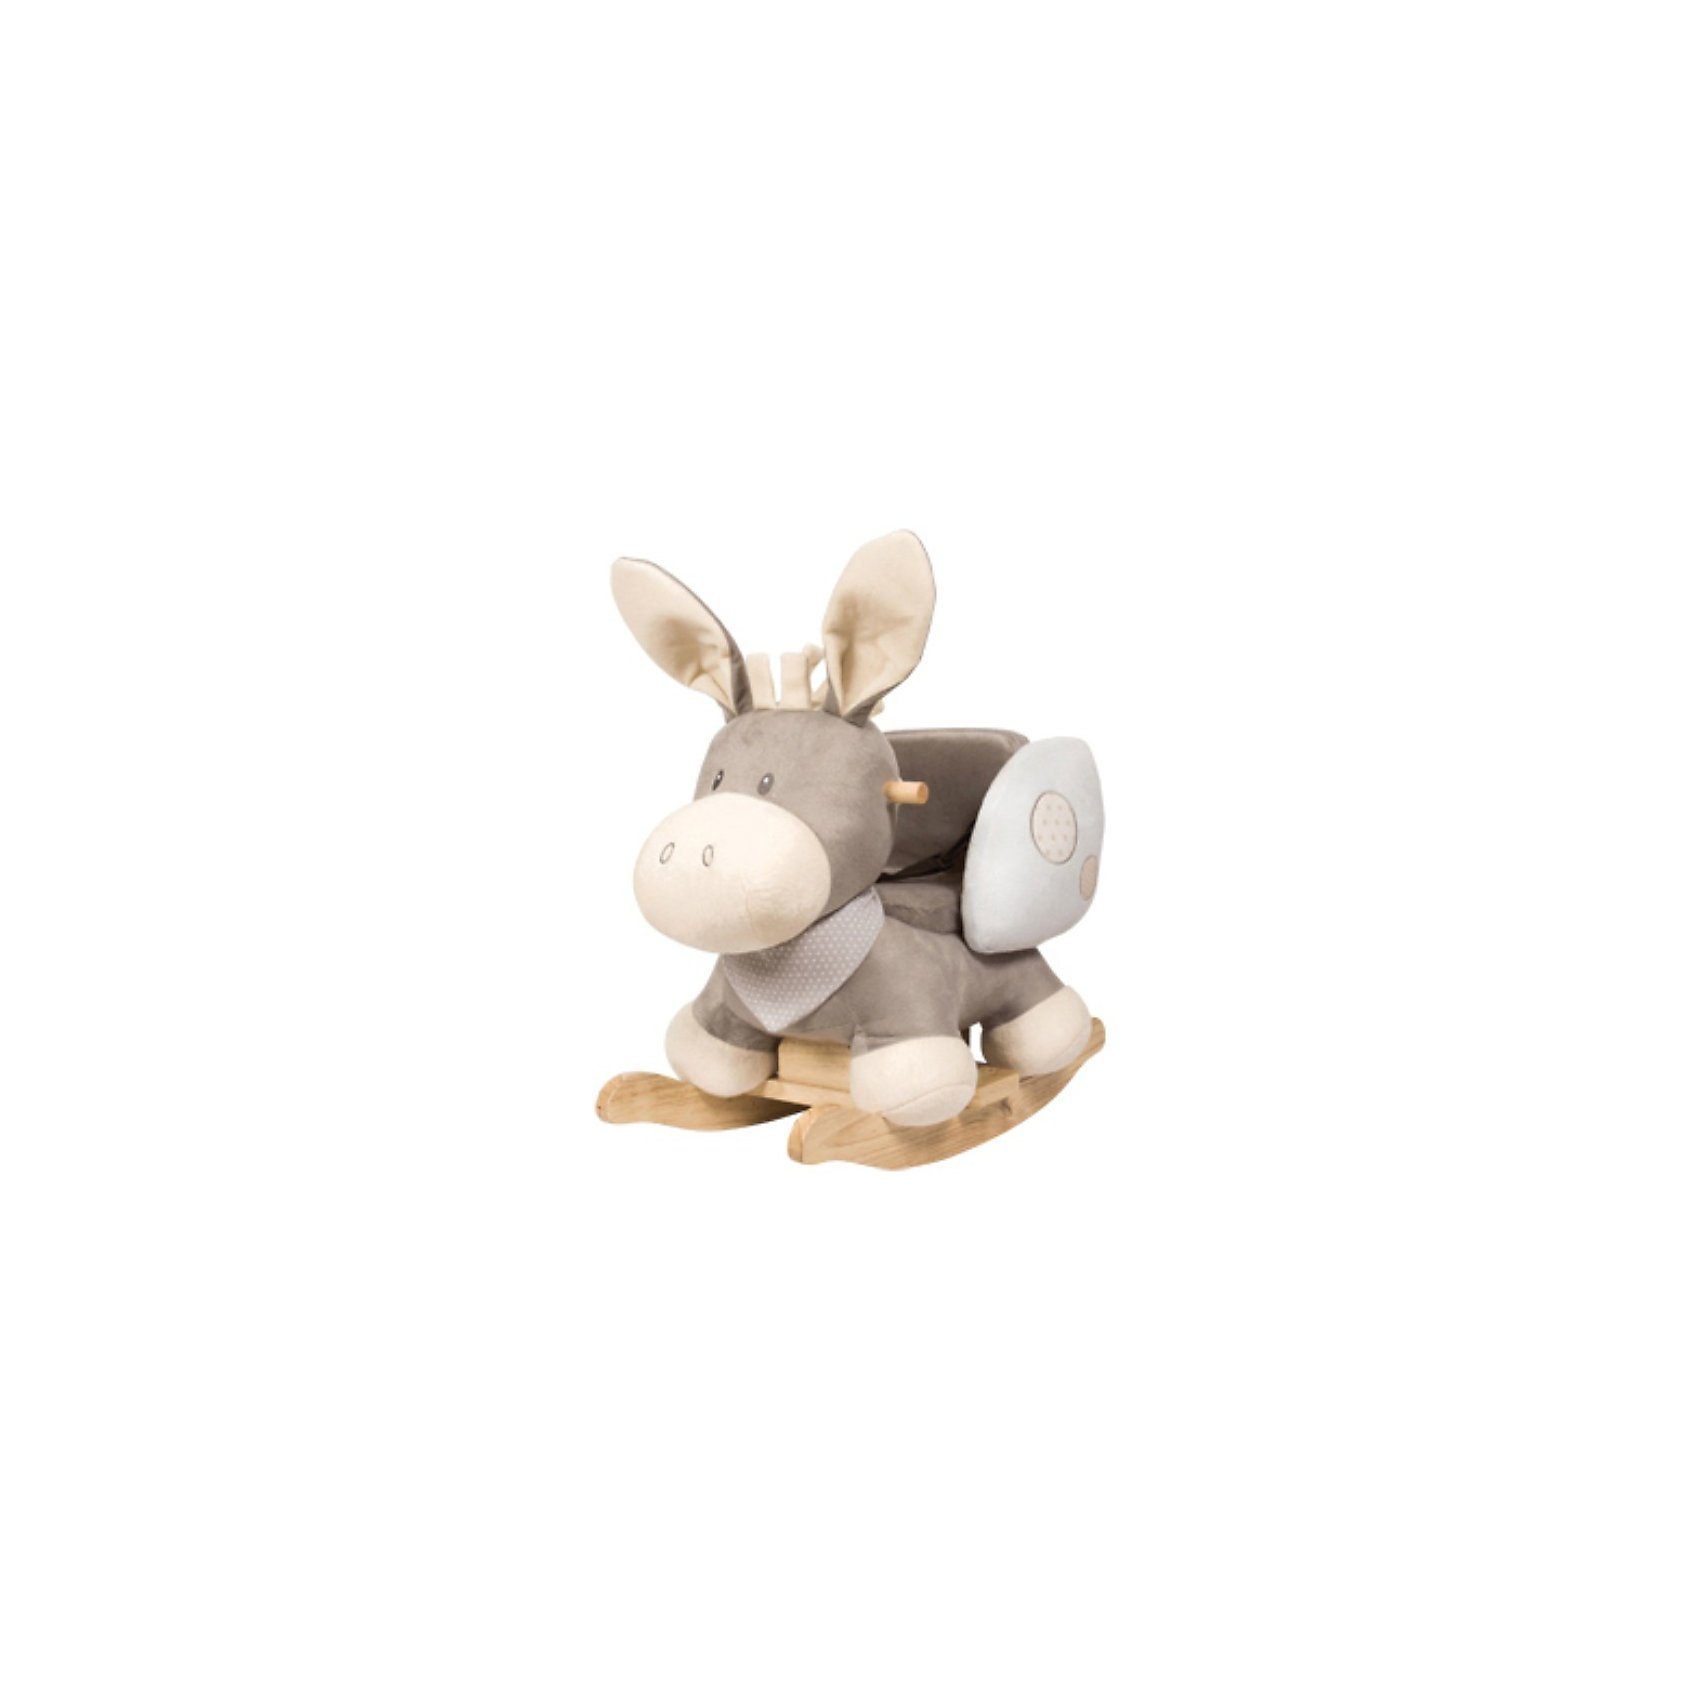 Nattou Schaukeltier Esel, Cappuccino, grau